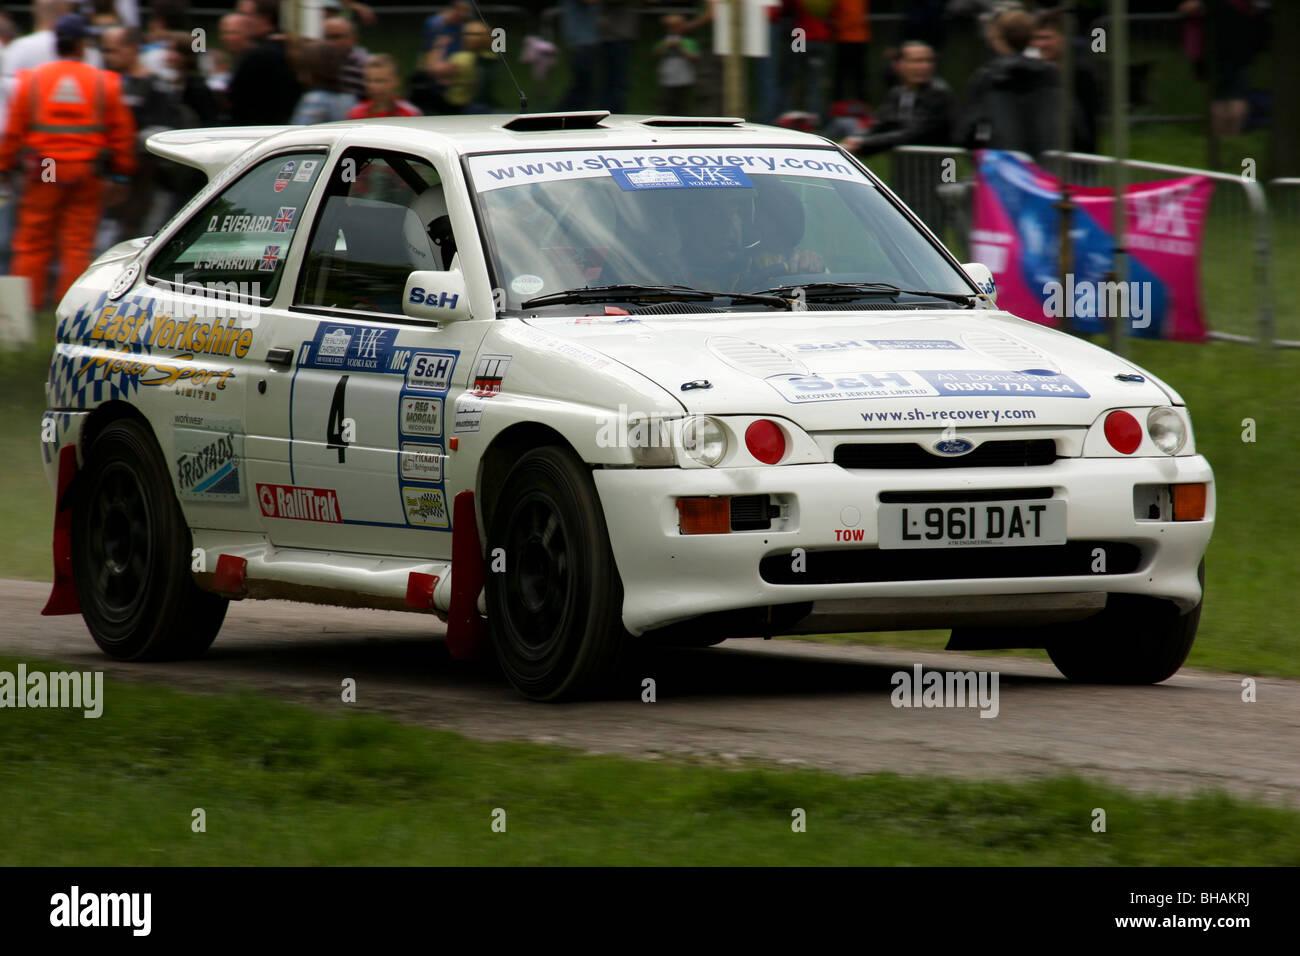 D Everard Ford Escort Cosworth Rallye am Chatsworths Wertungsprüfung Stockbild